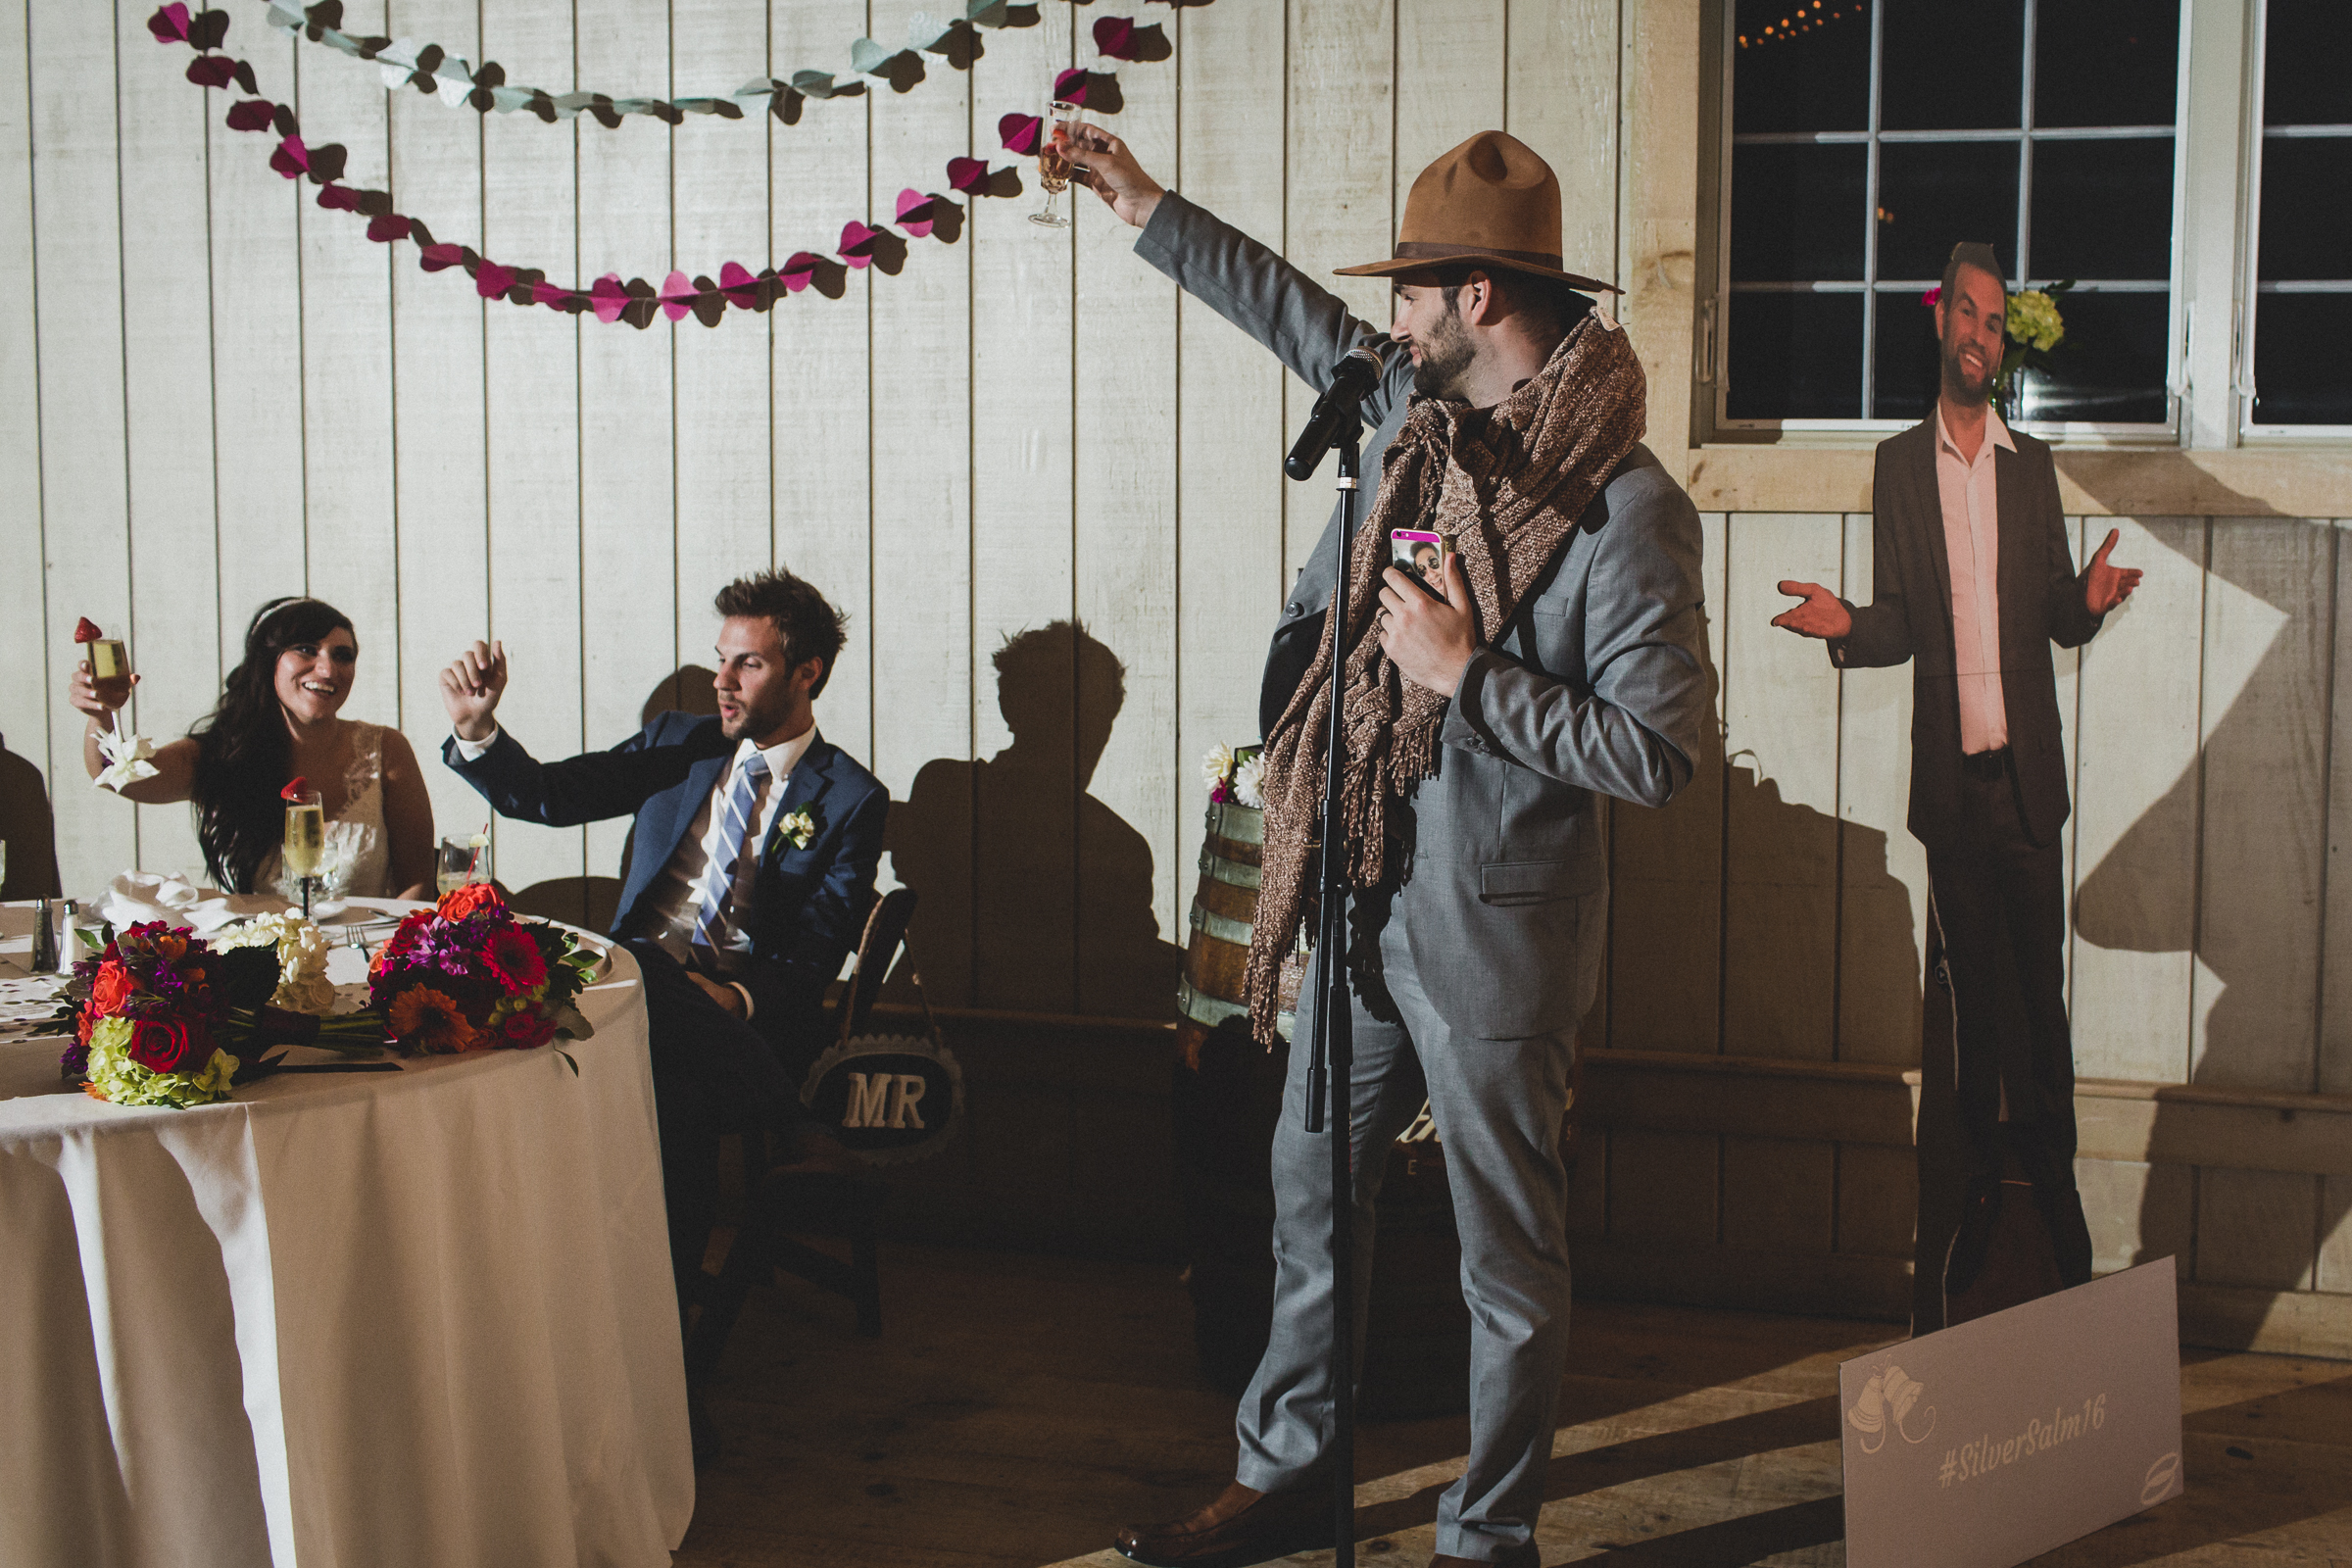 Martha-Clara-Vineyard-Long-Island-Documentary-Wedding-Photographer-82.jpg